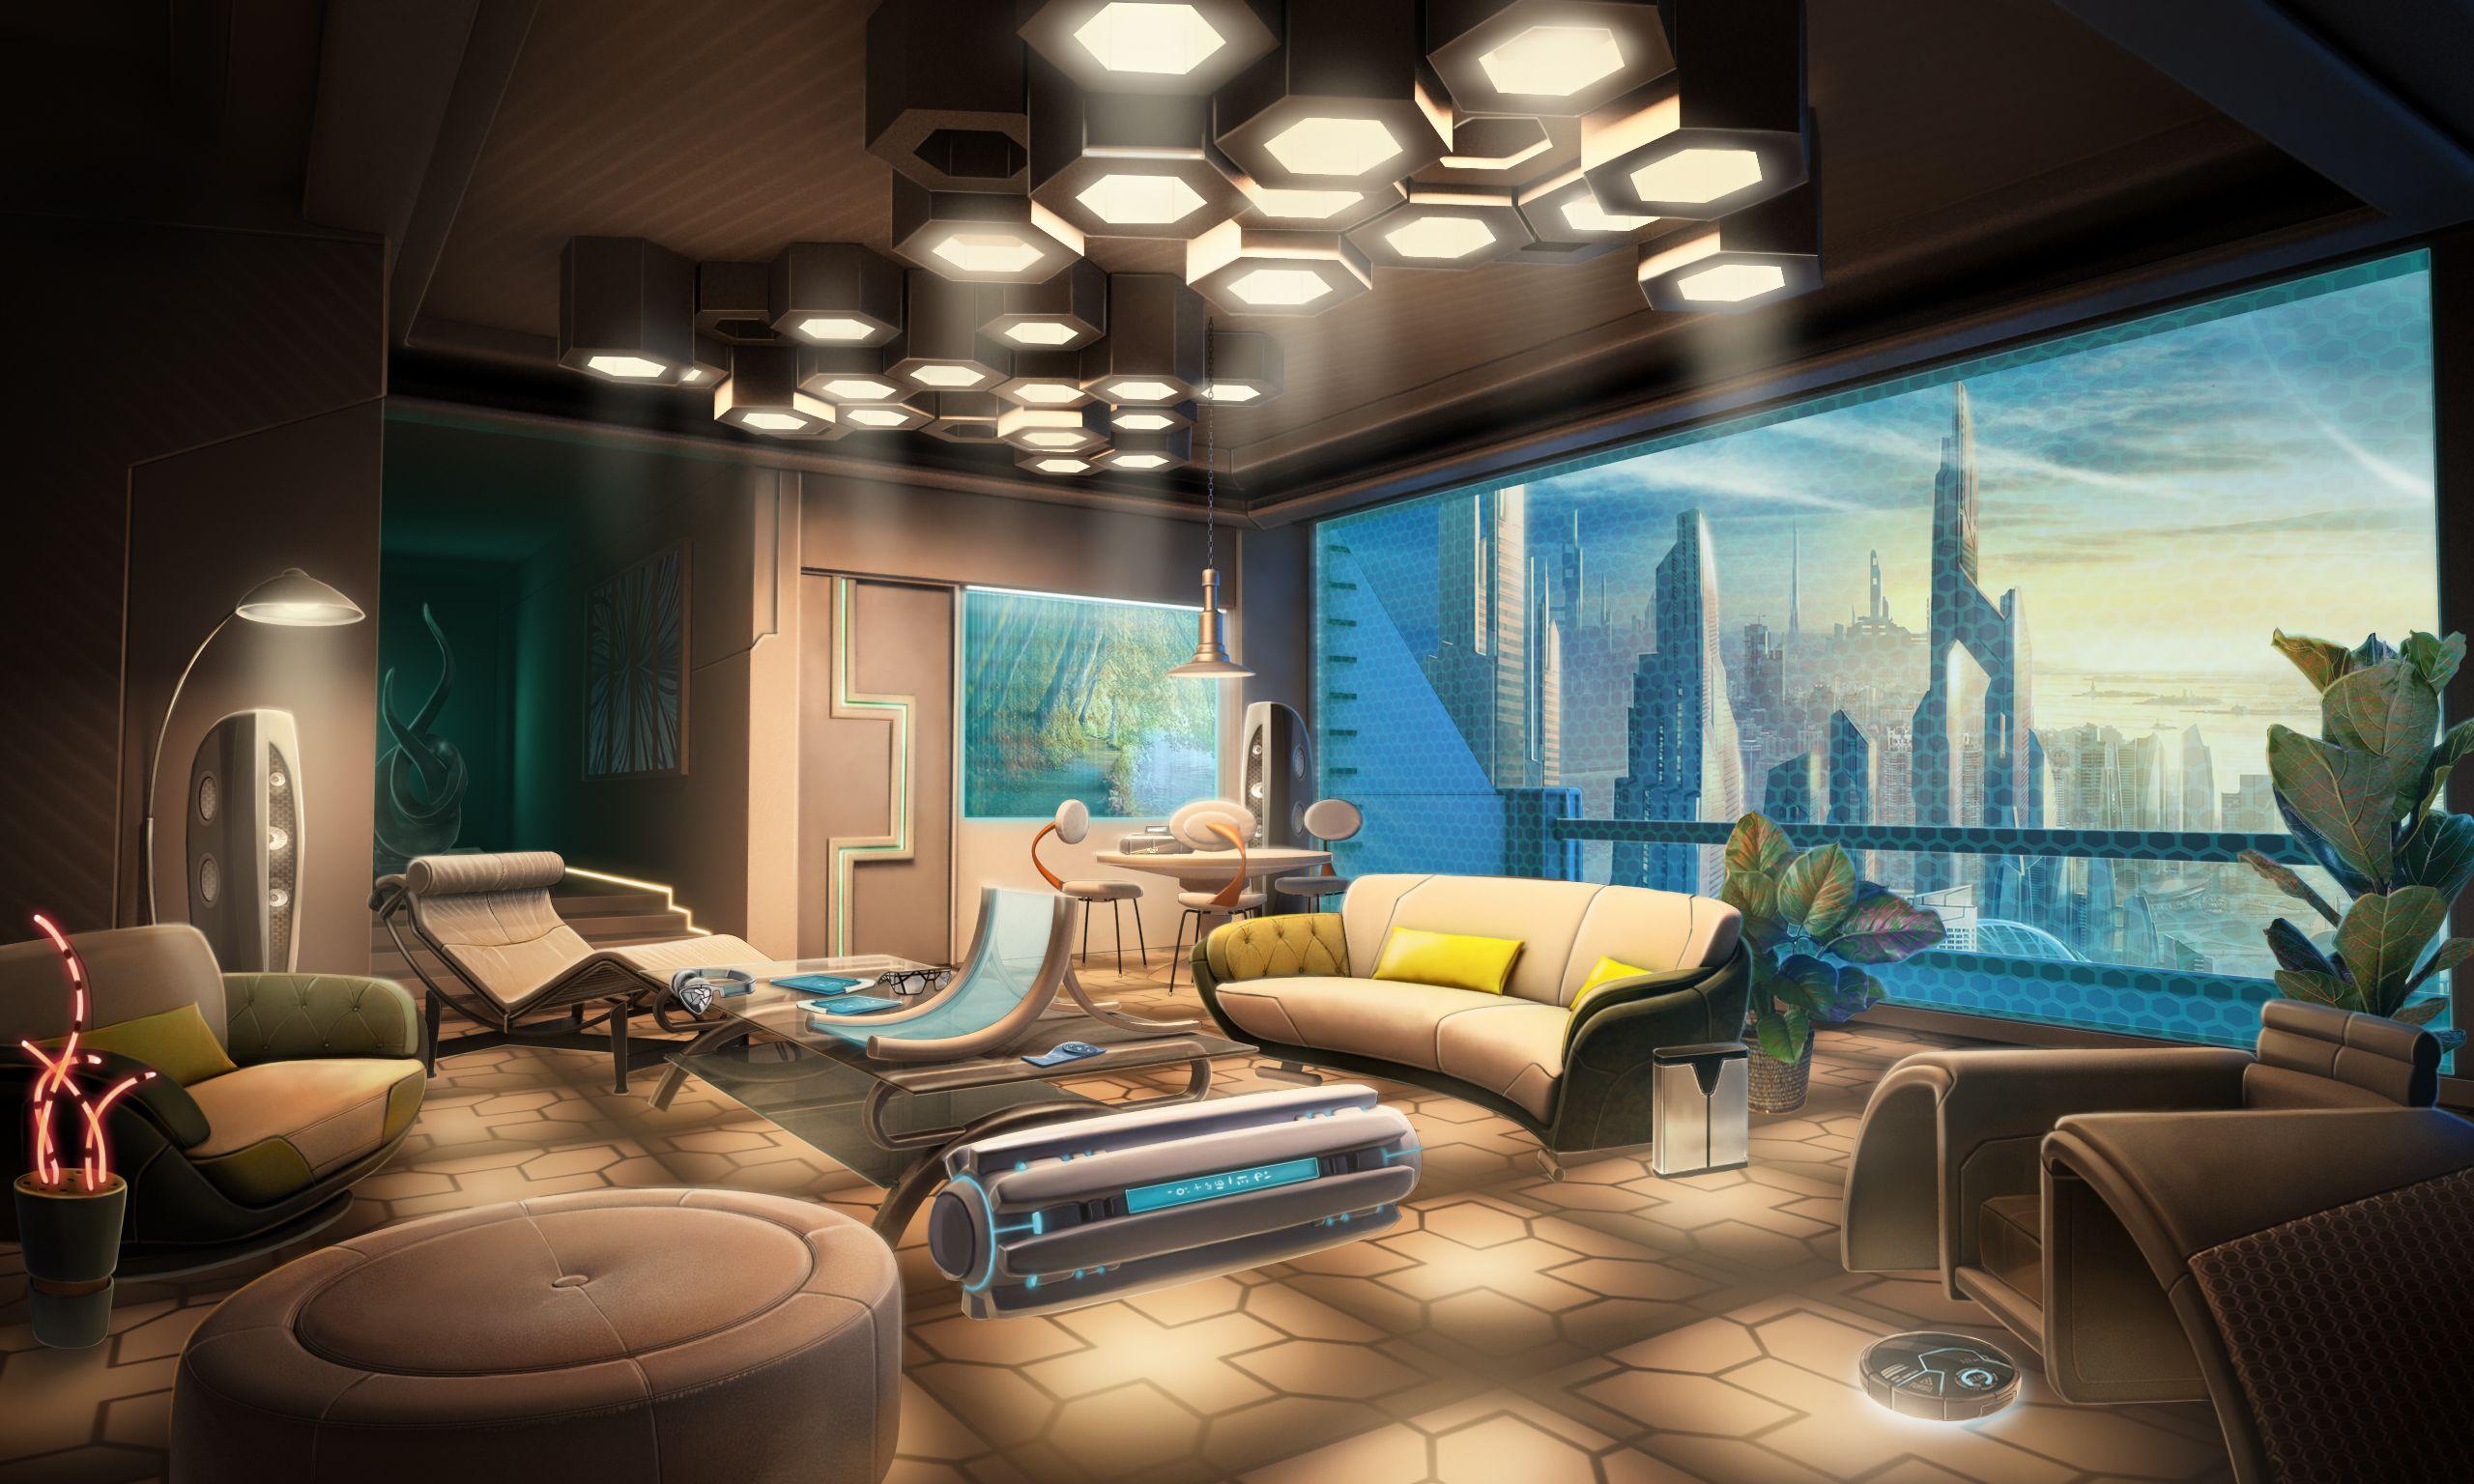 Condo Apartment Modern Furniture Livingroom Art Gameart